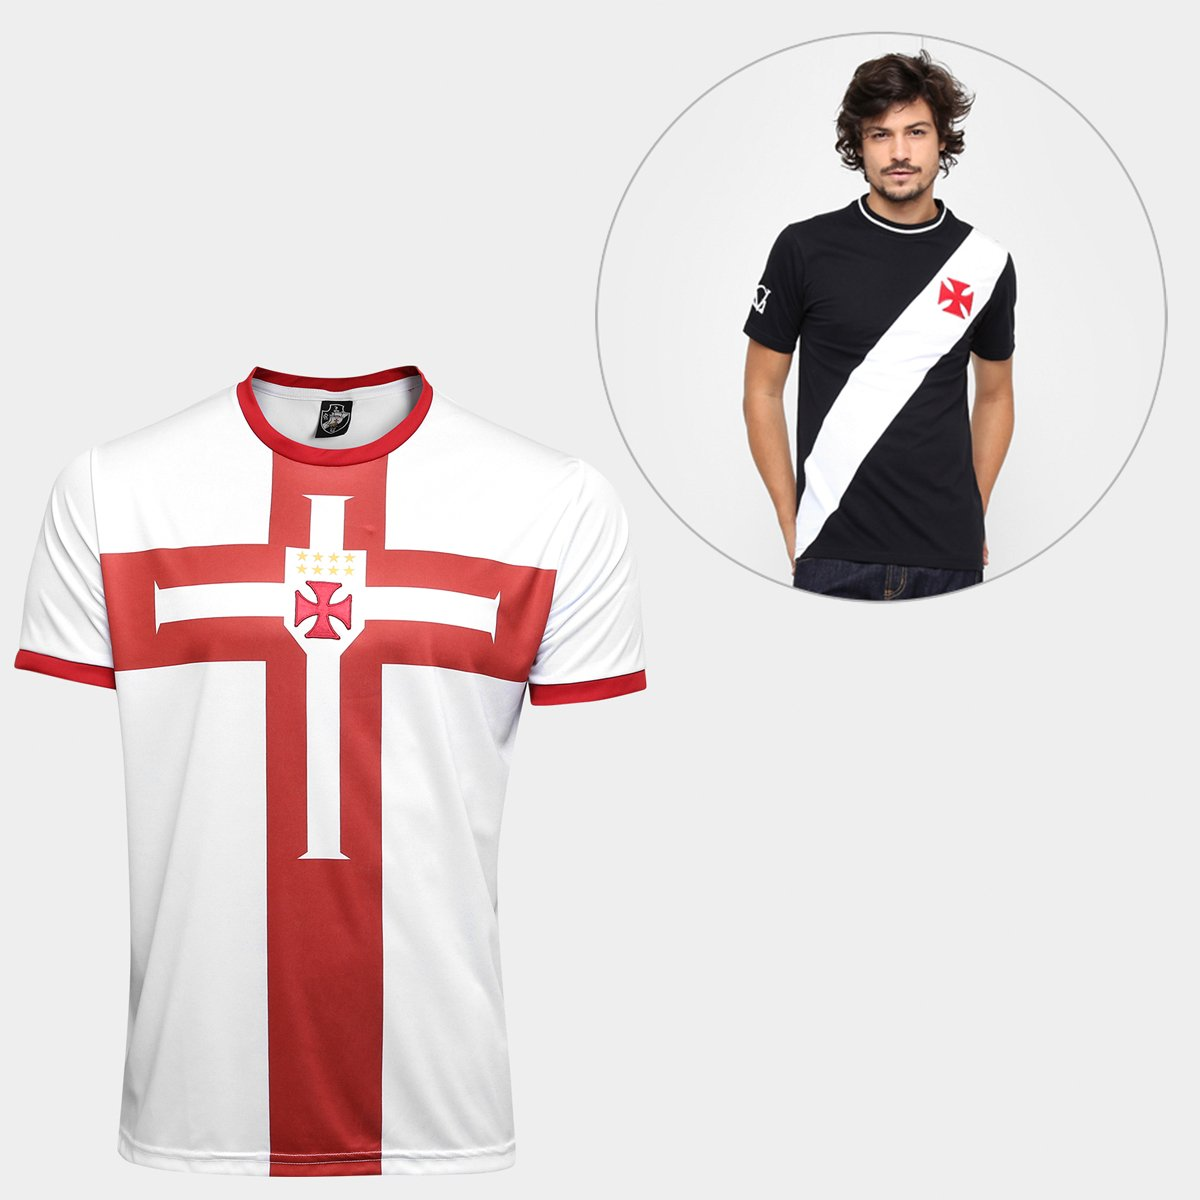 bddd527f82 Kit Camisa Vasco Templária Edição Limitada + Camiseta Vasco Recorte ...